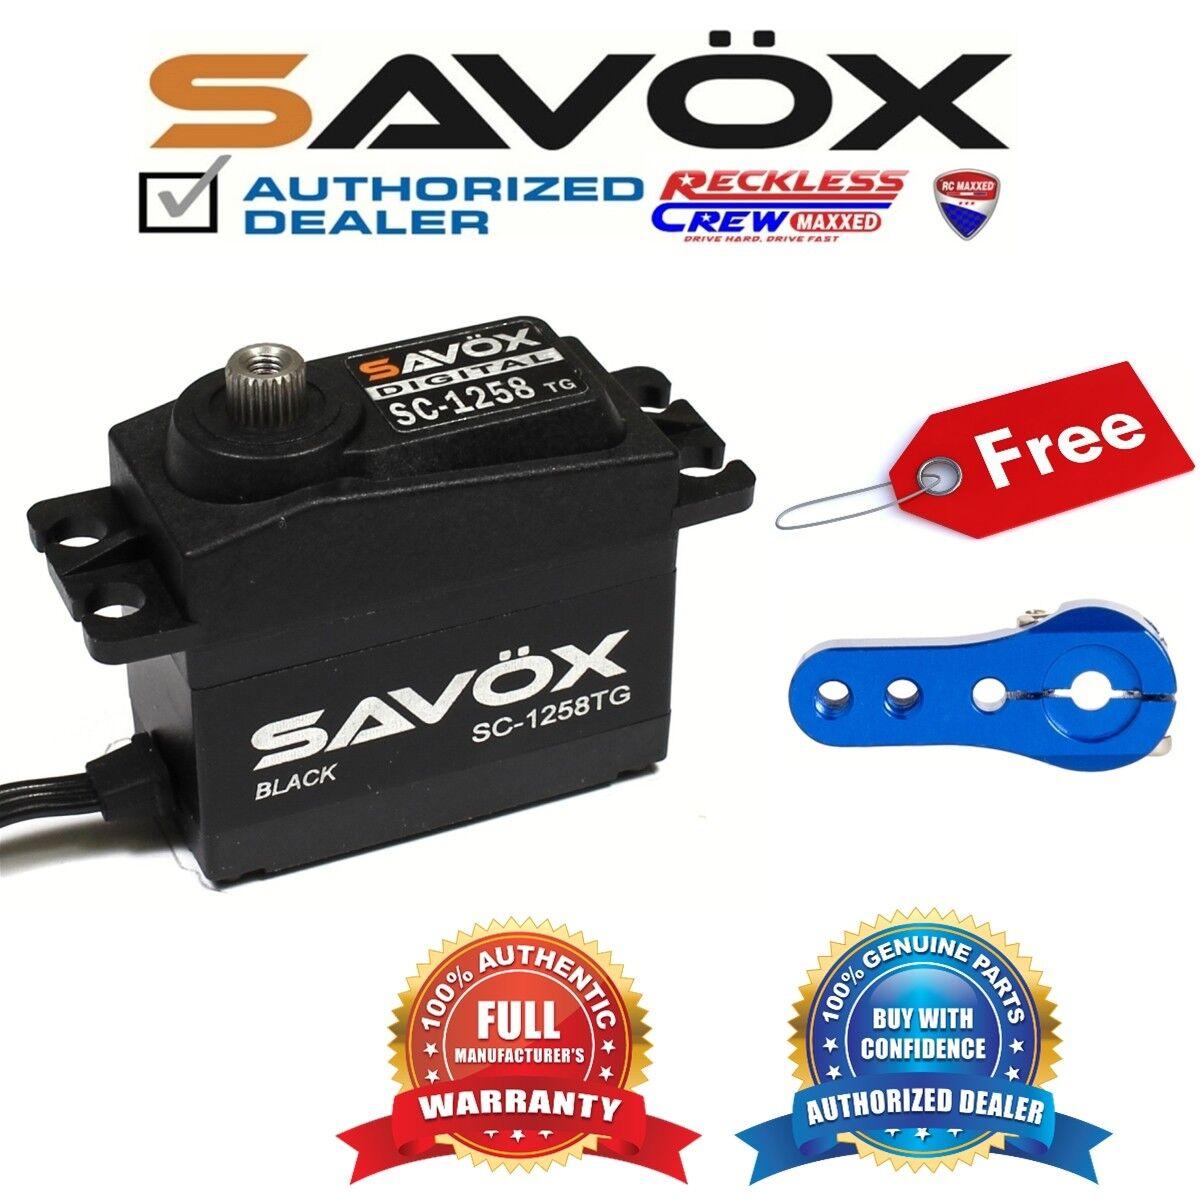 Savox SC-1258TG-BE Digital Servo Coreless Negro + Gratis Aluminio Servo Horn Azul